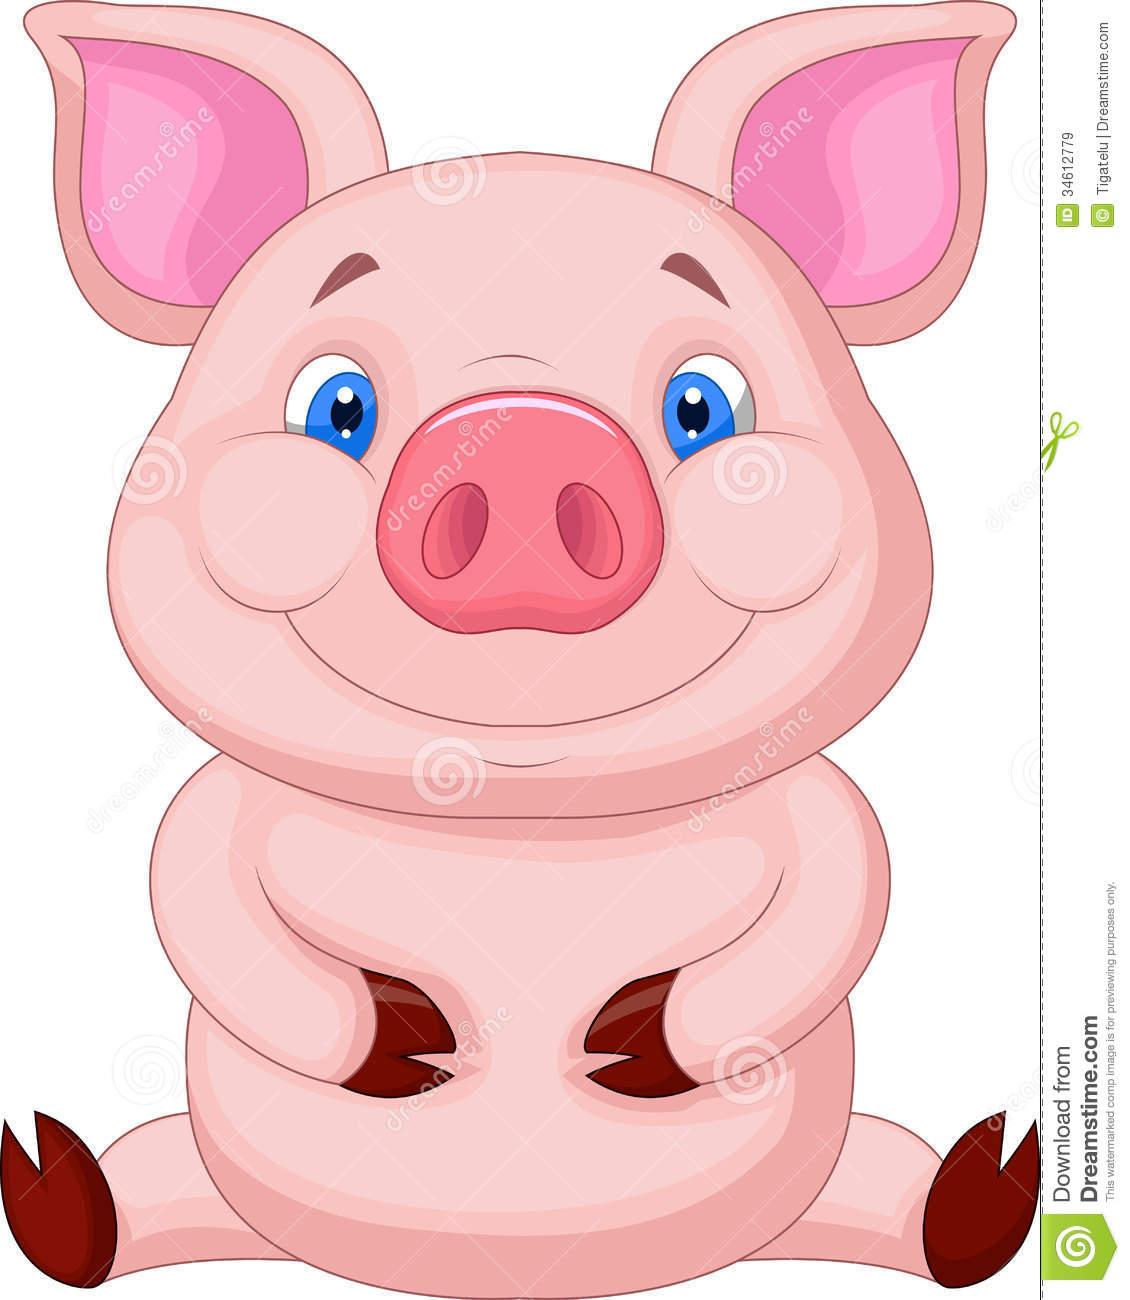 Baby Pig PNG HD Transparent HDPNG Images